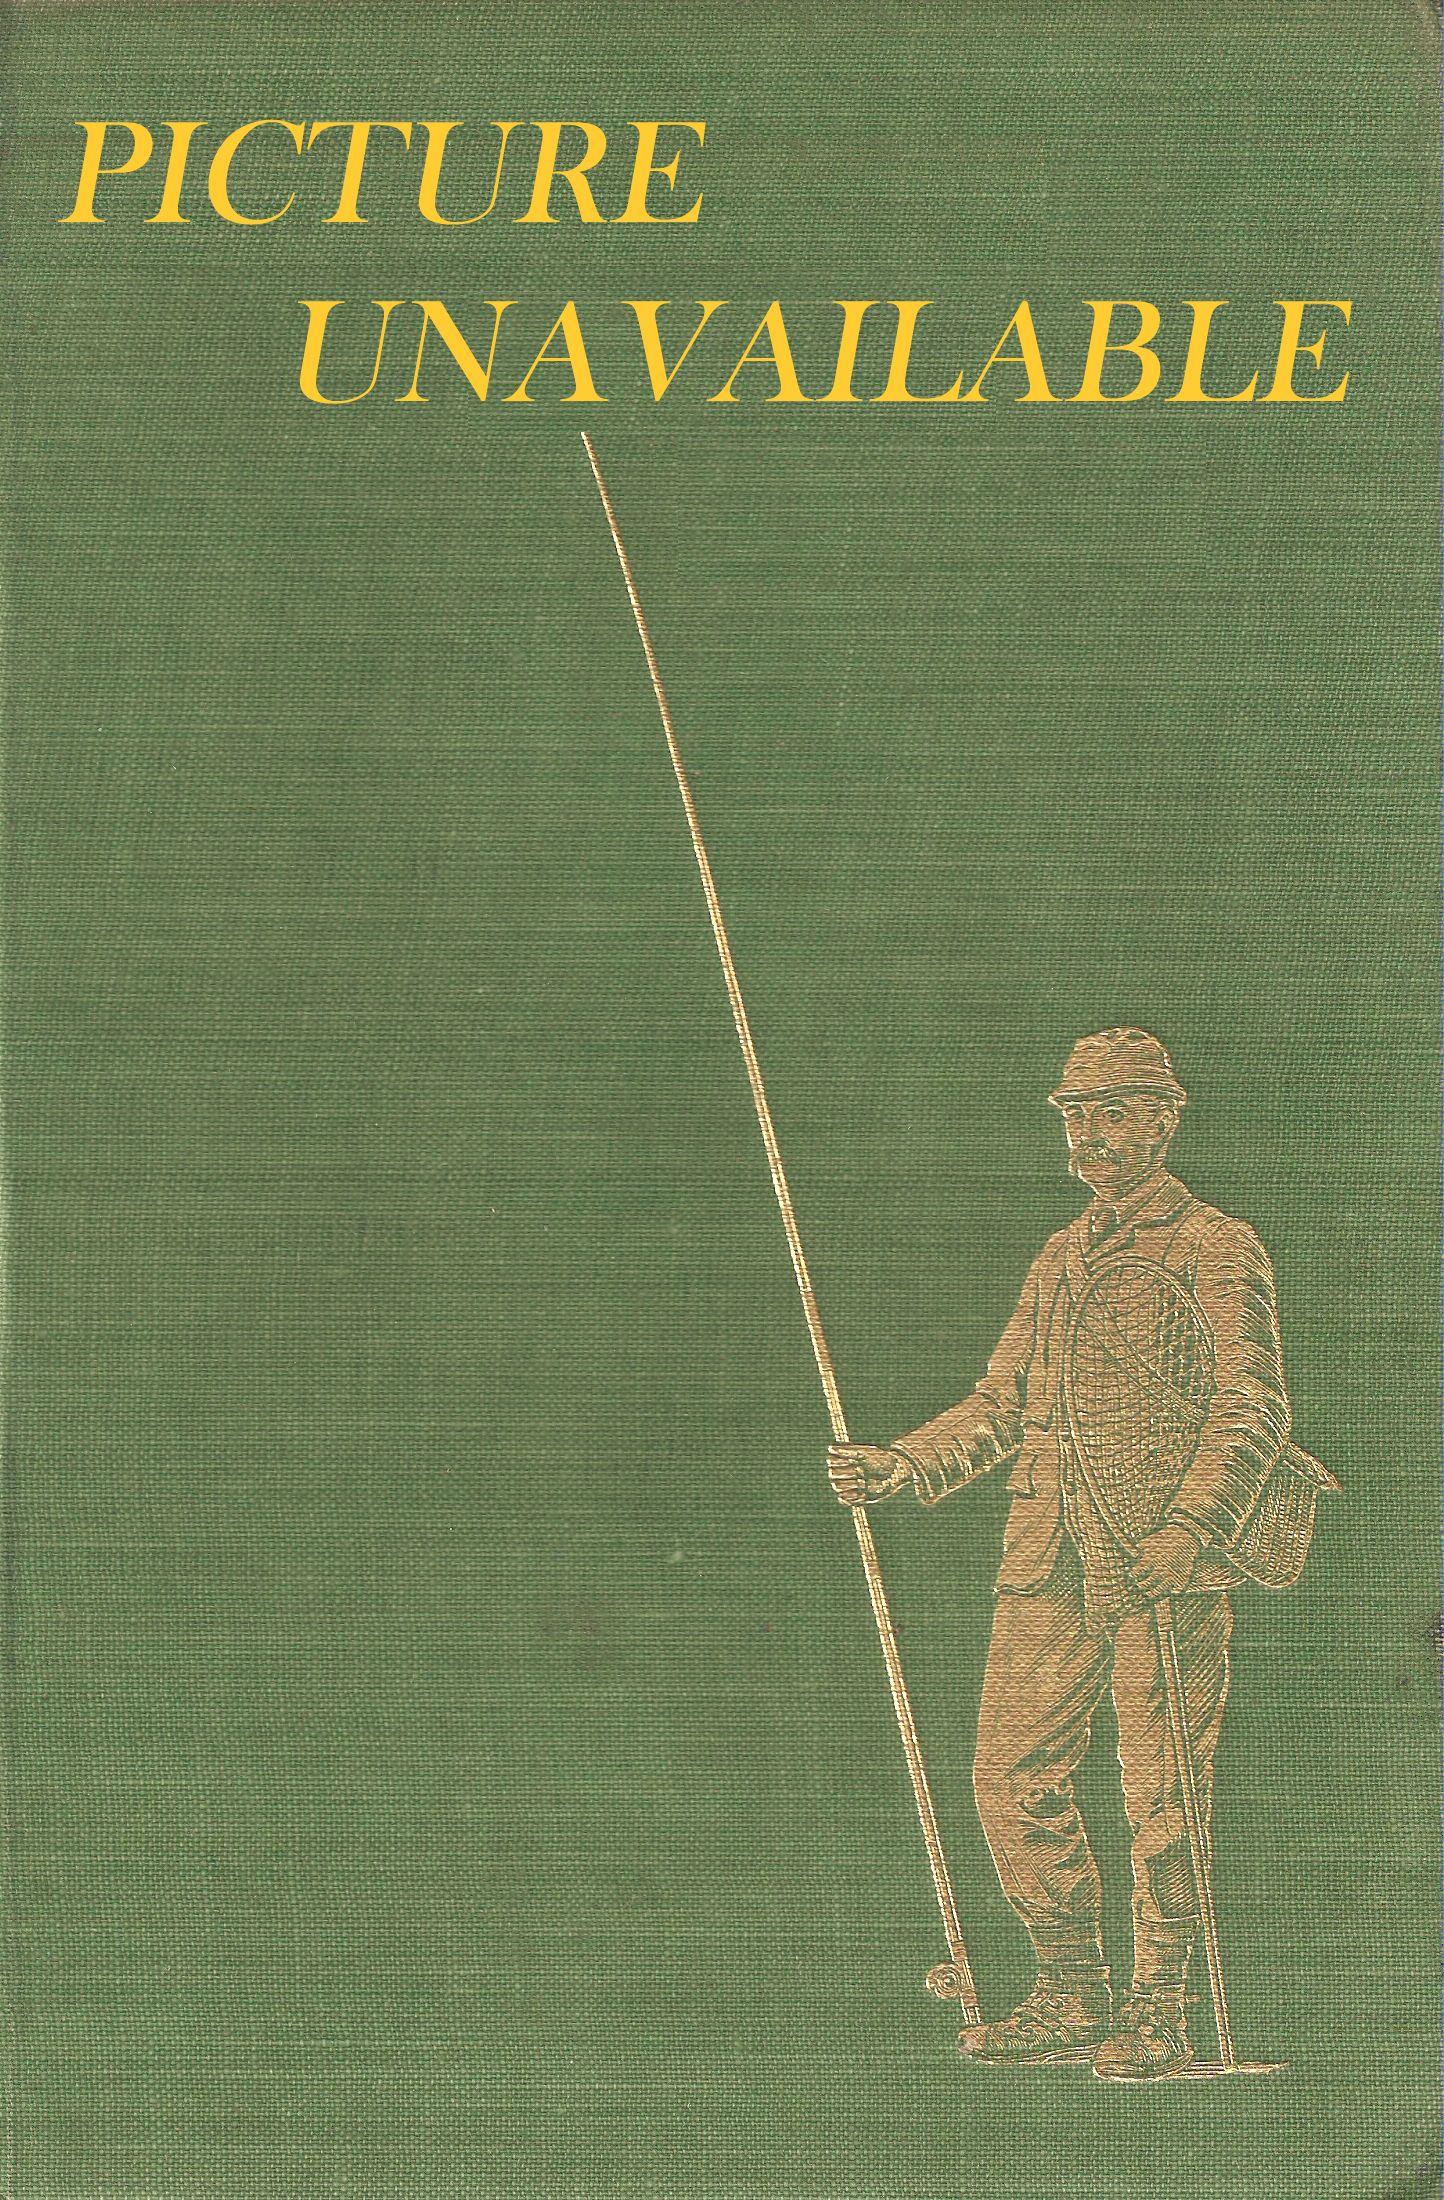 MAYLIN ROB COARSE FISHING BOOK ONE LAST CAST CARP bargain HARDBACK new